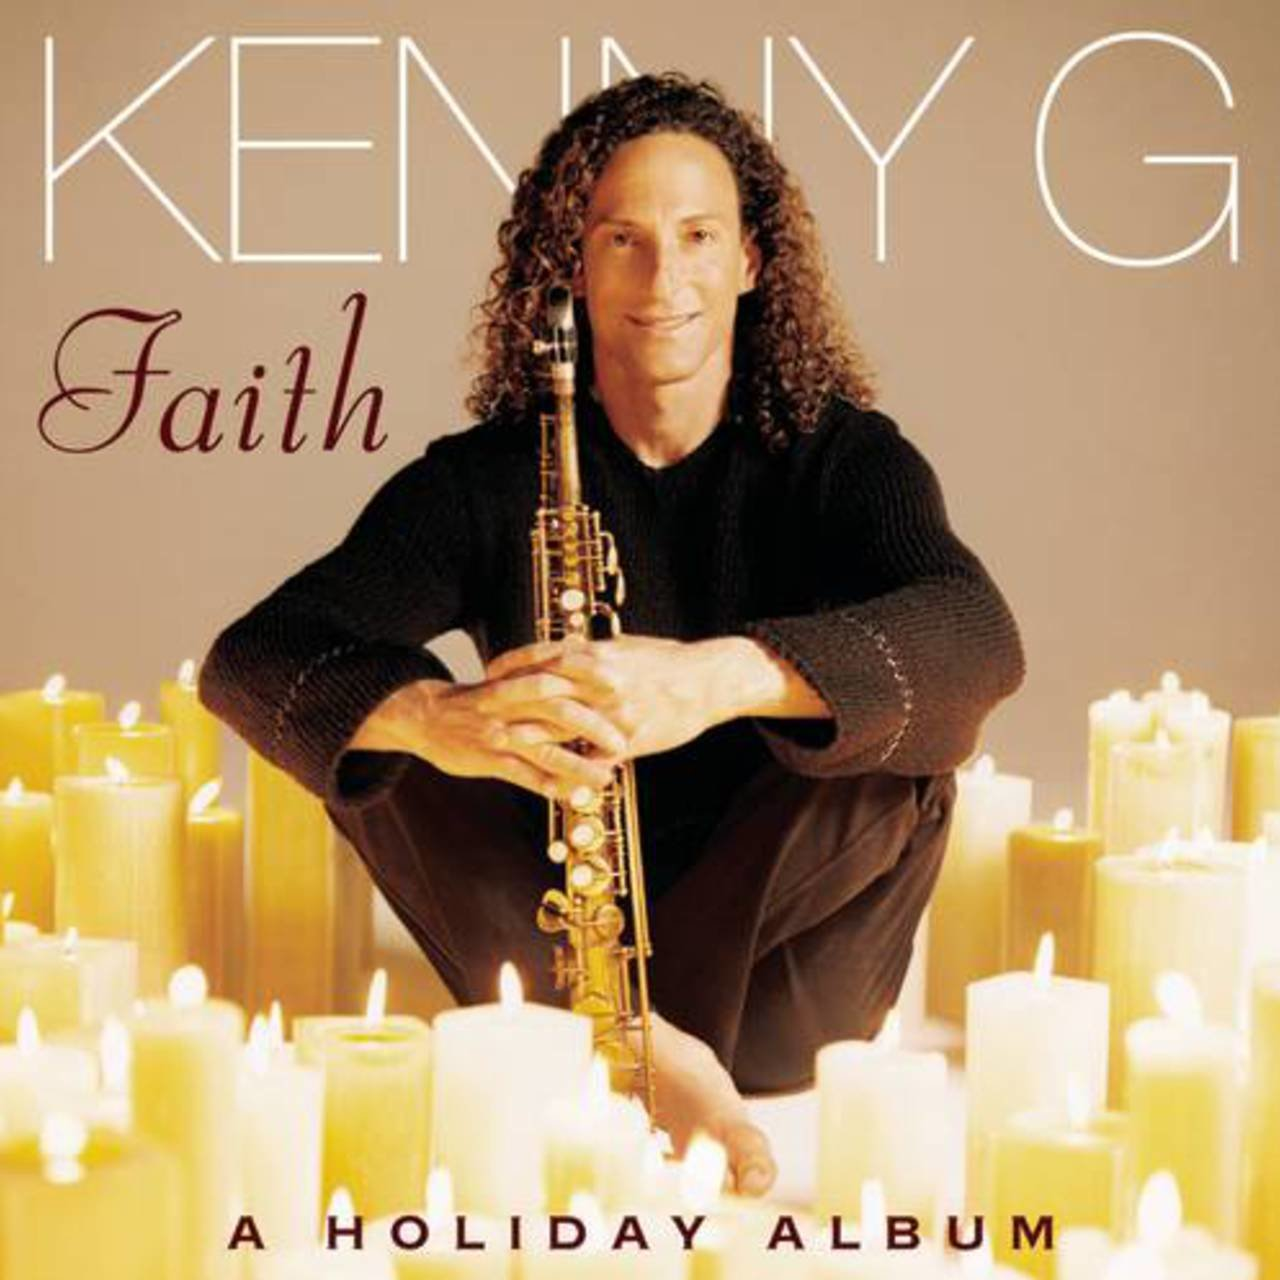 Tidal Listen To Ultimate Kenny G On Tidal